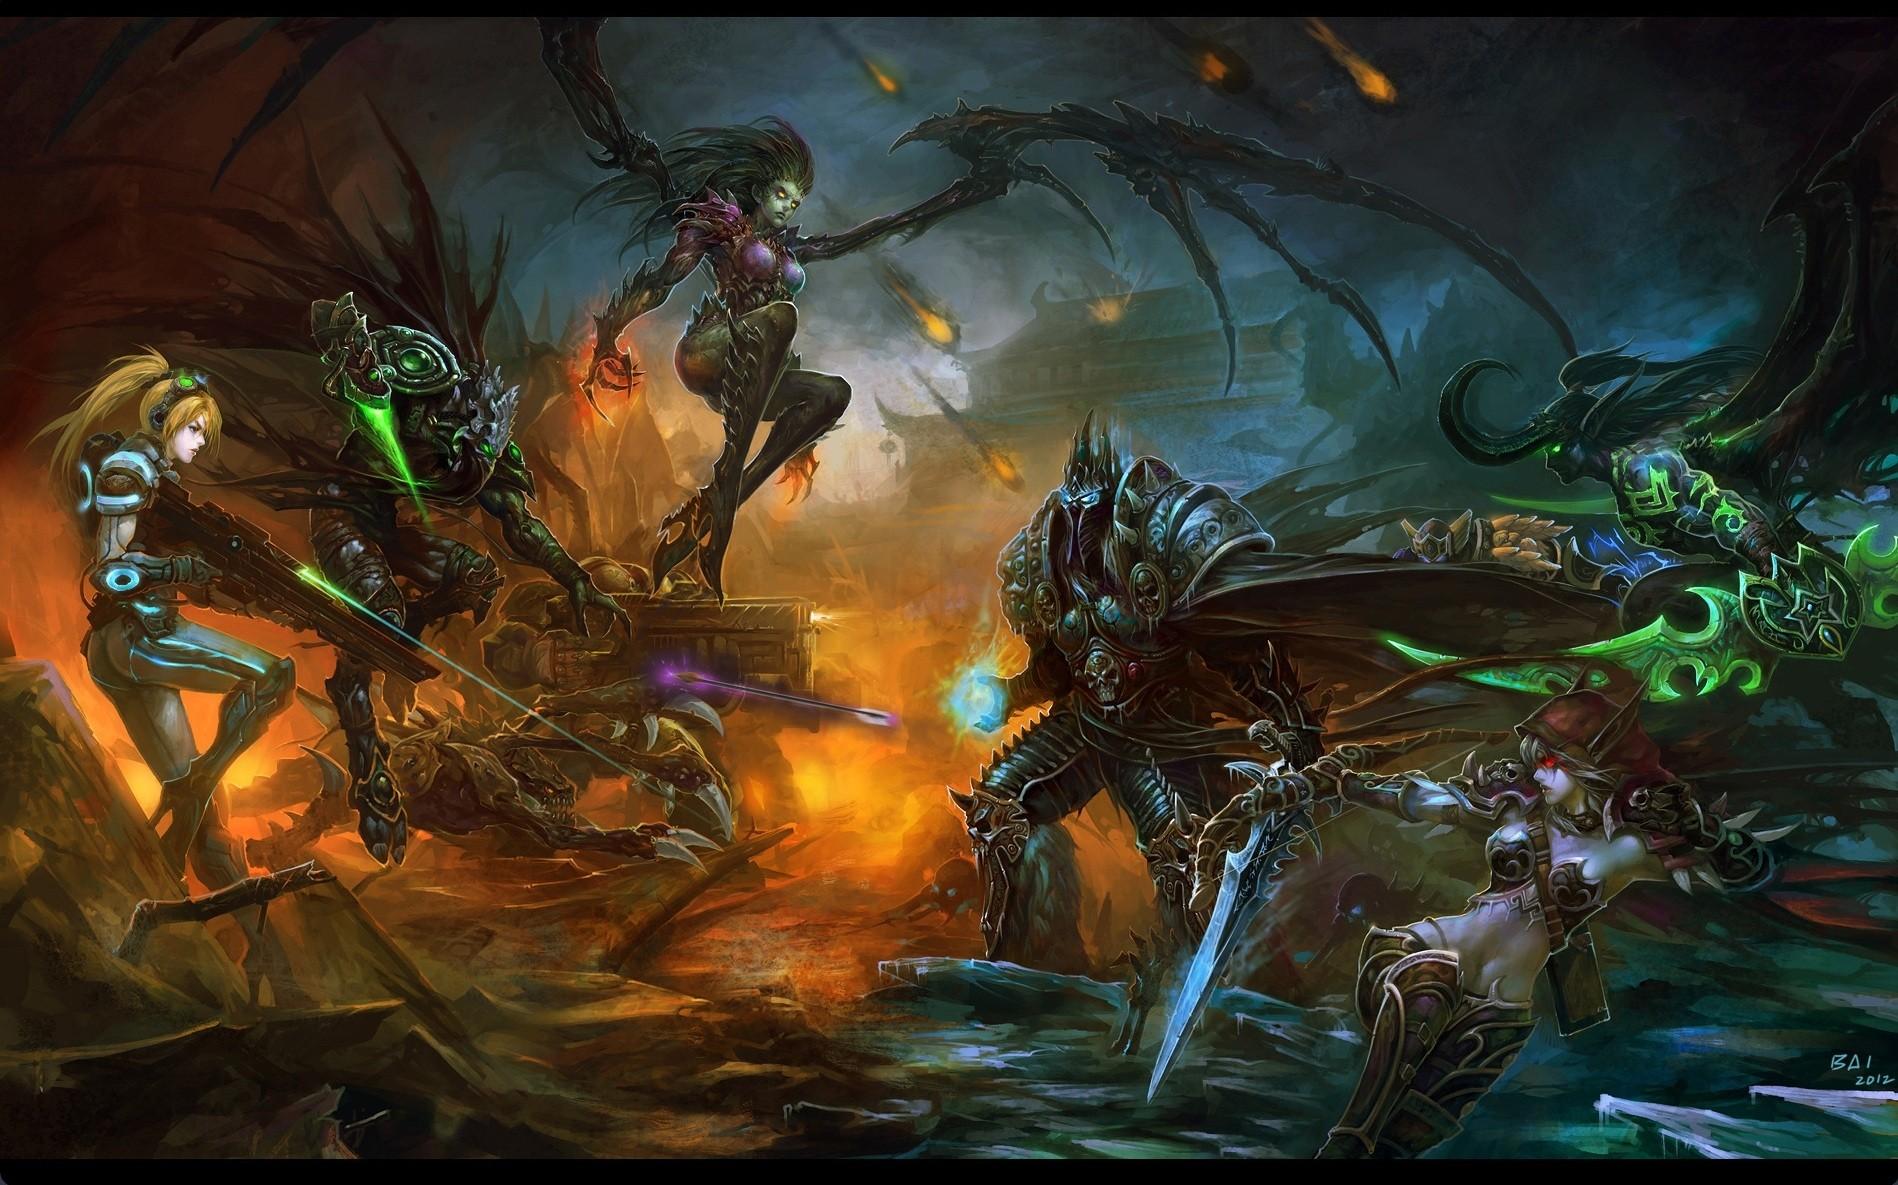 Lich King de World of Warcraft - 1898x1185